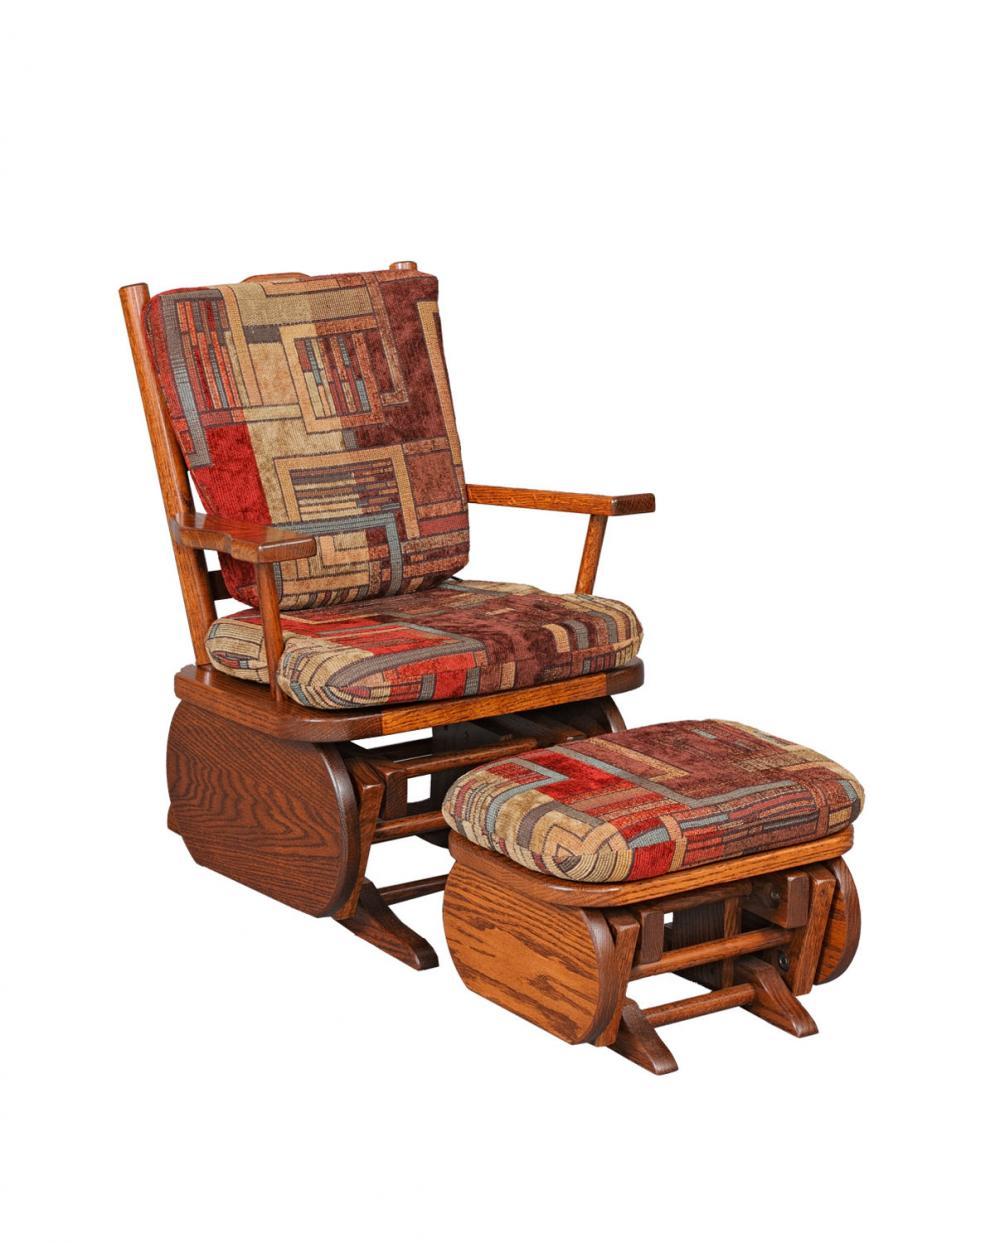 Jakeu0026#39;s Amish Furniture - #20-9 Childu0026#39;s Glider with Ottoman